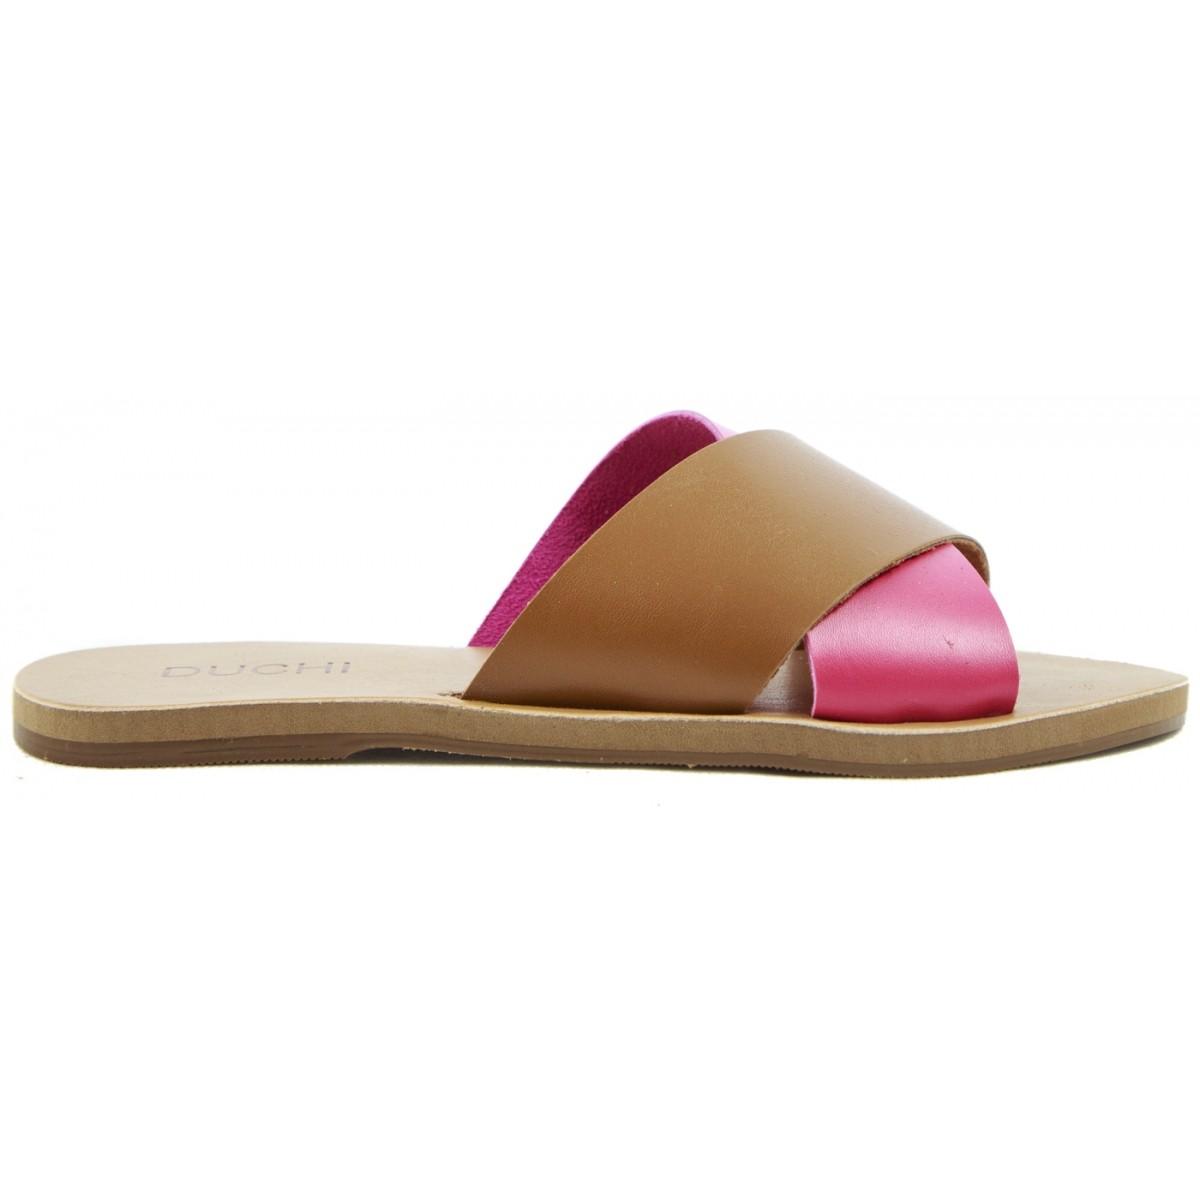 Rasteira X Caramelo / Pink